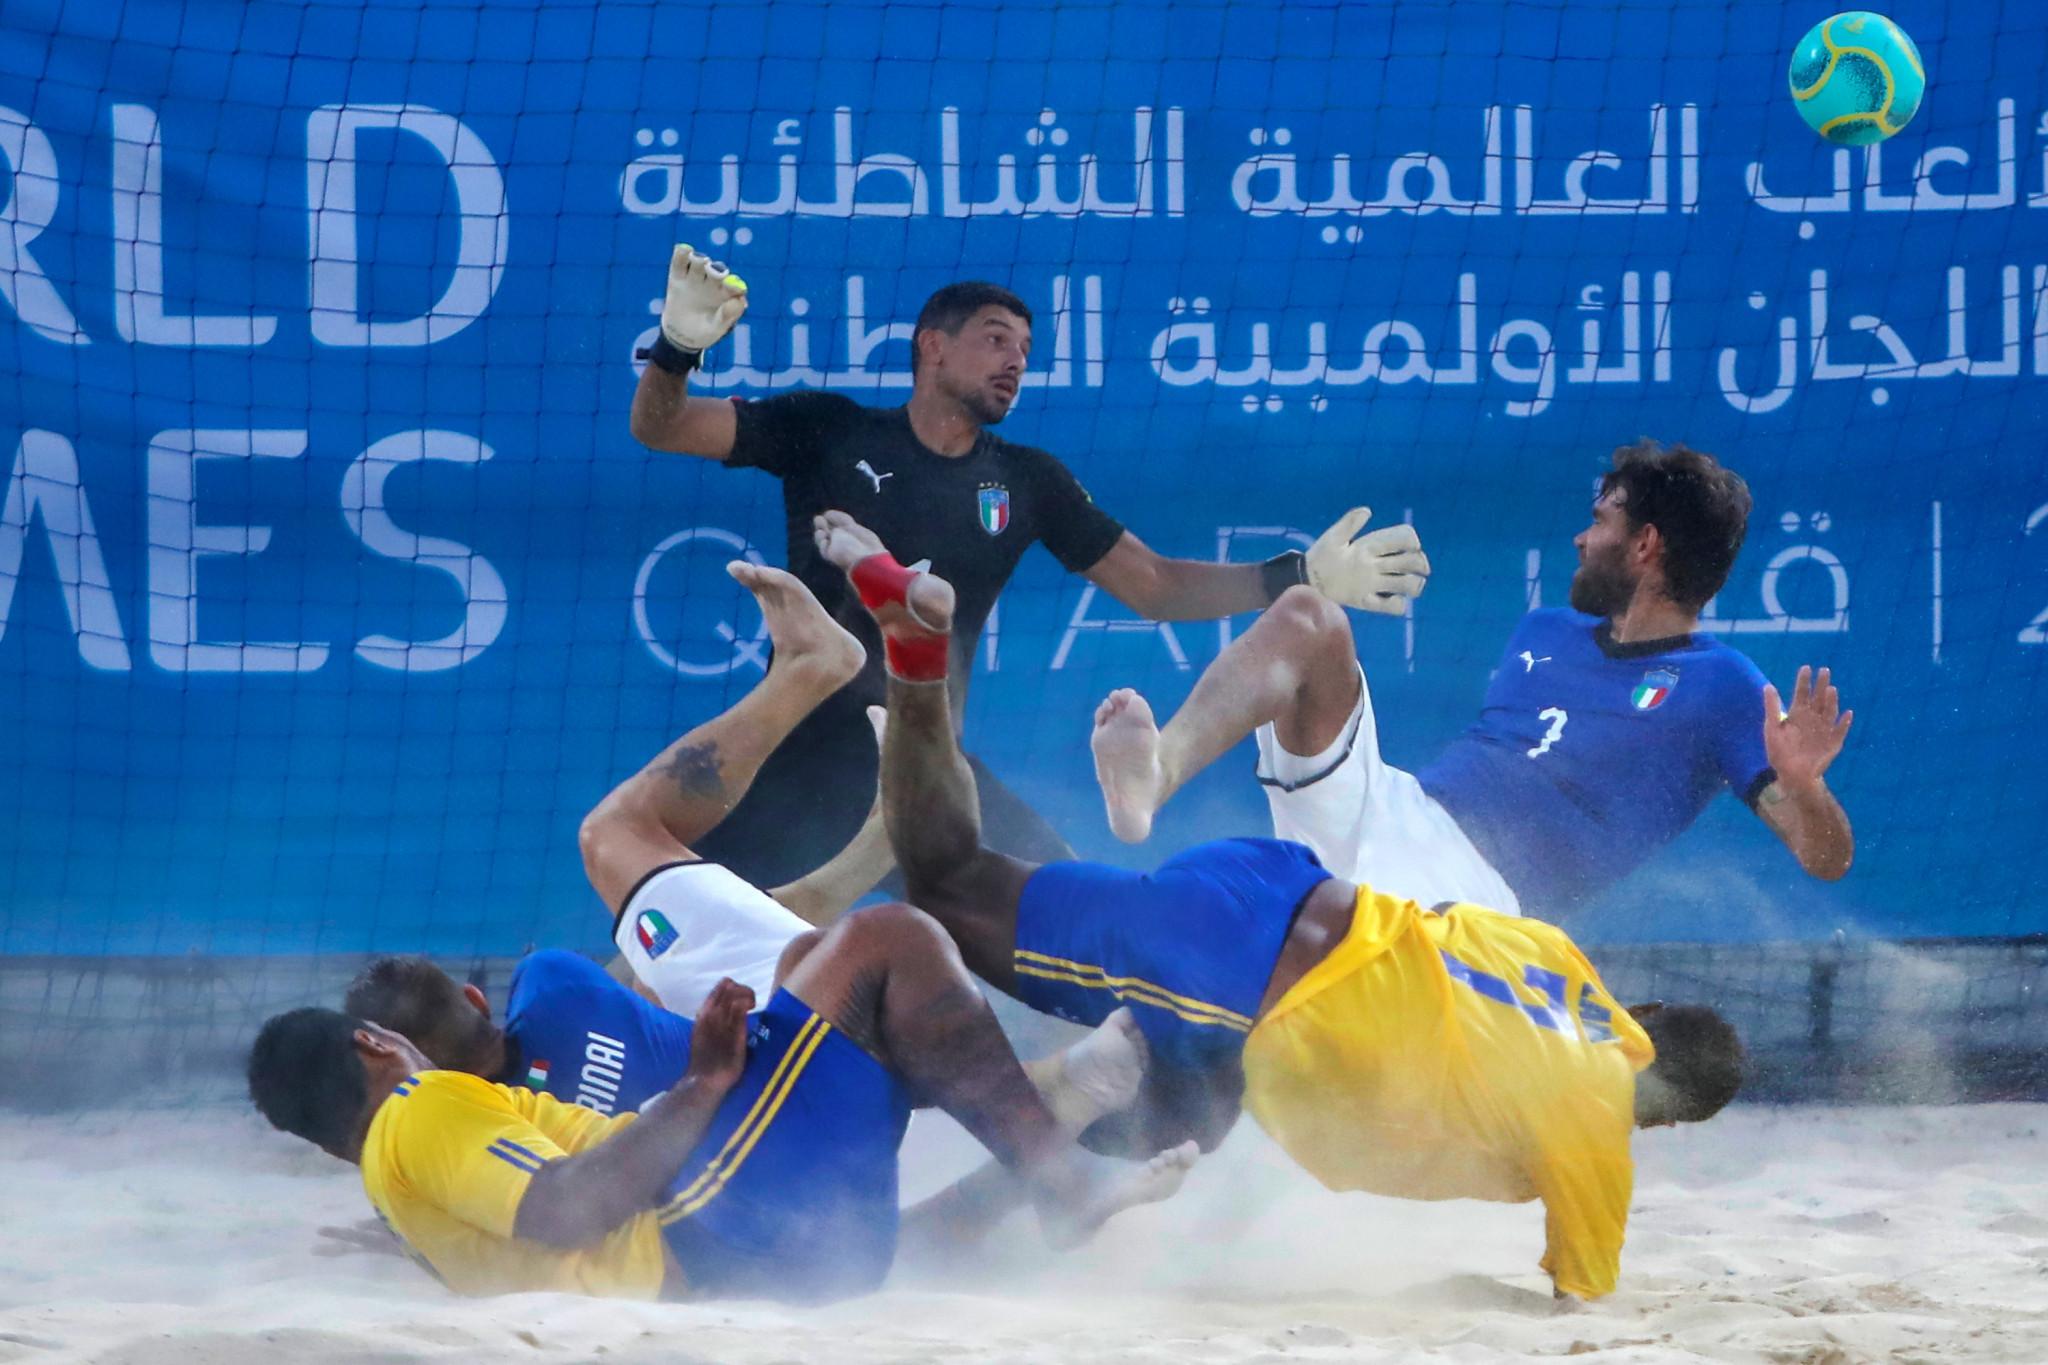 Beach soccer is being played at Katara Beach ©ANOC